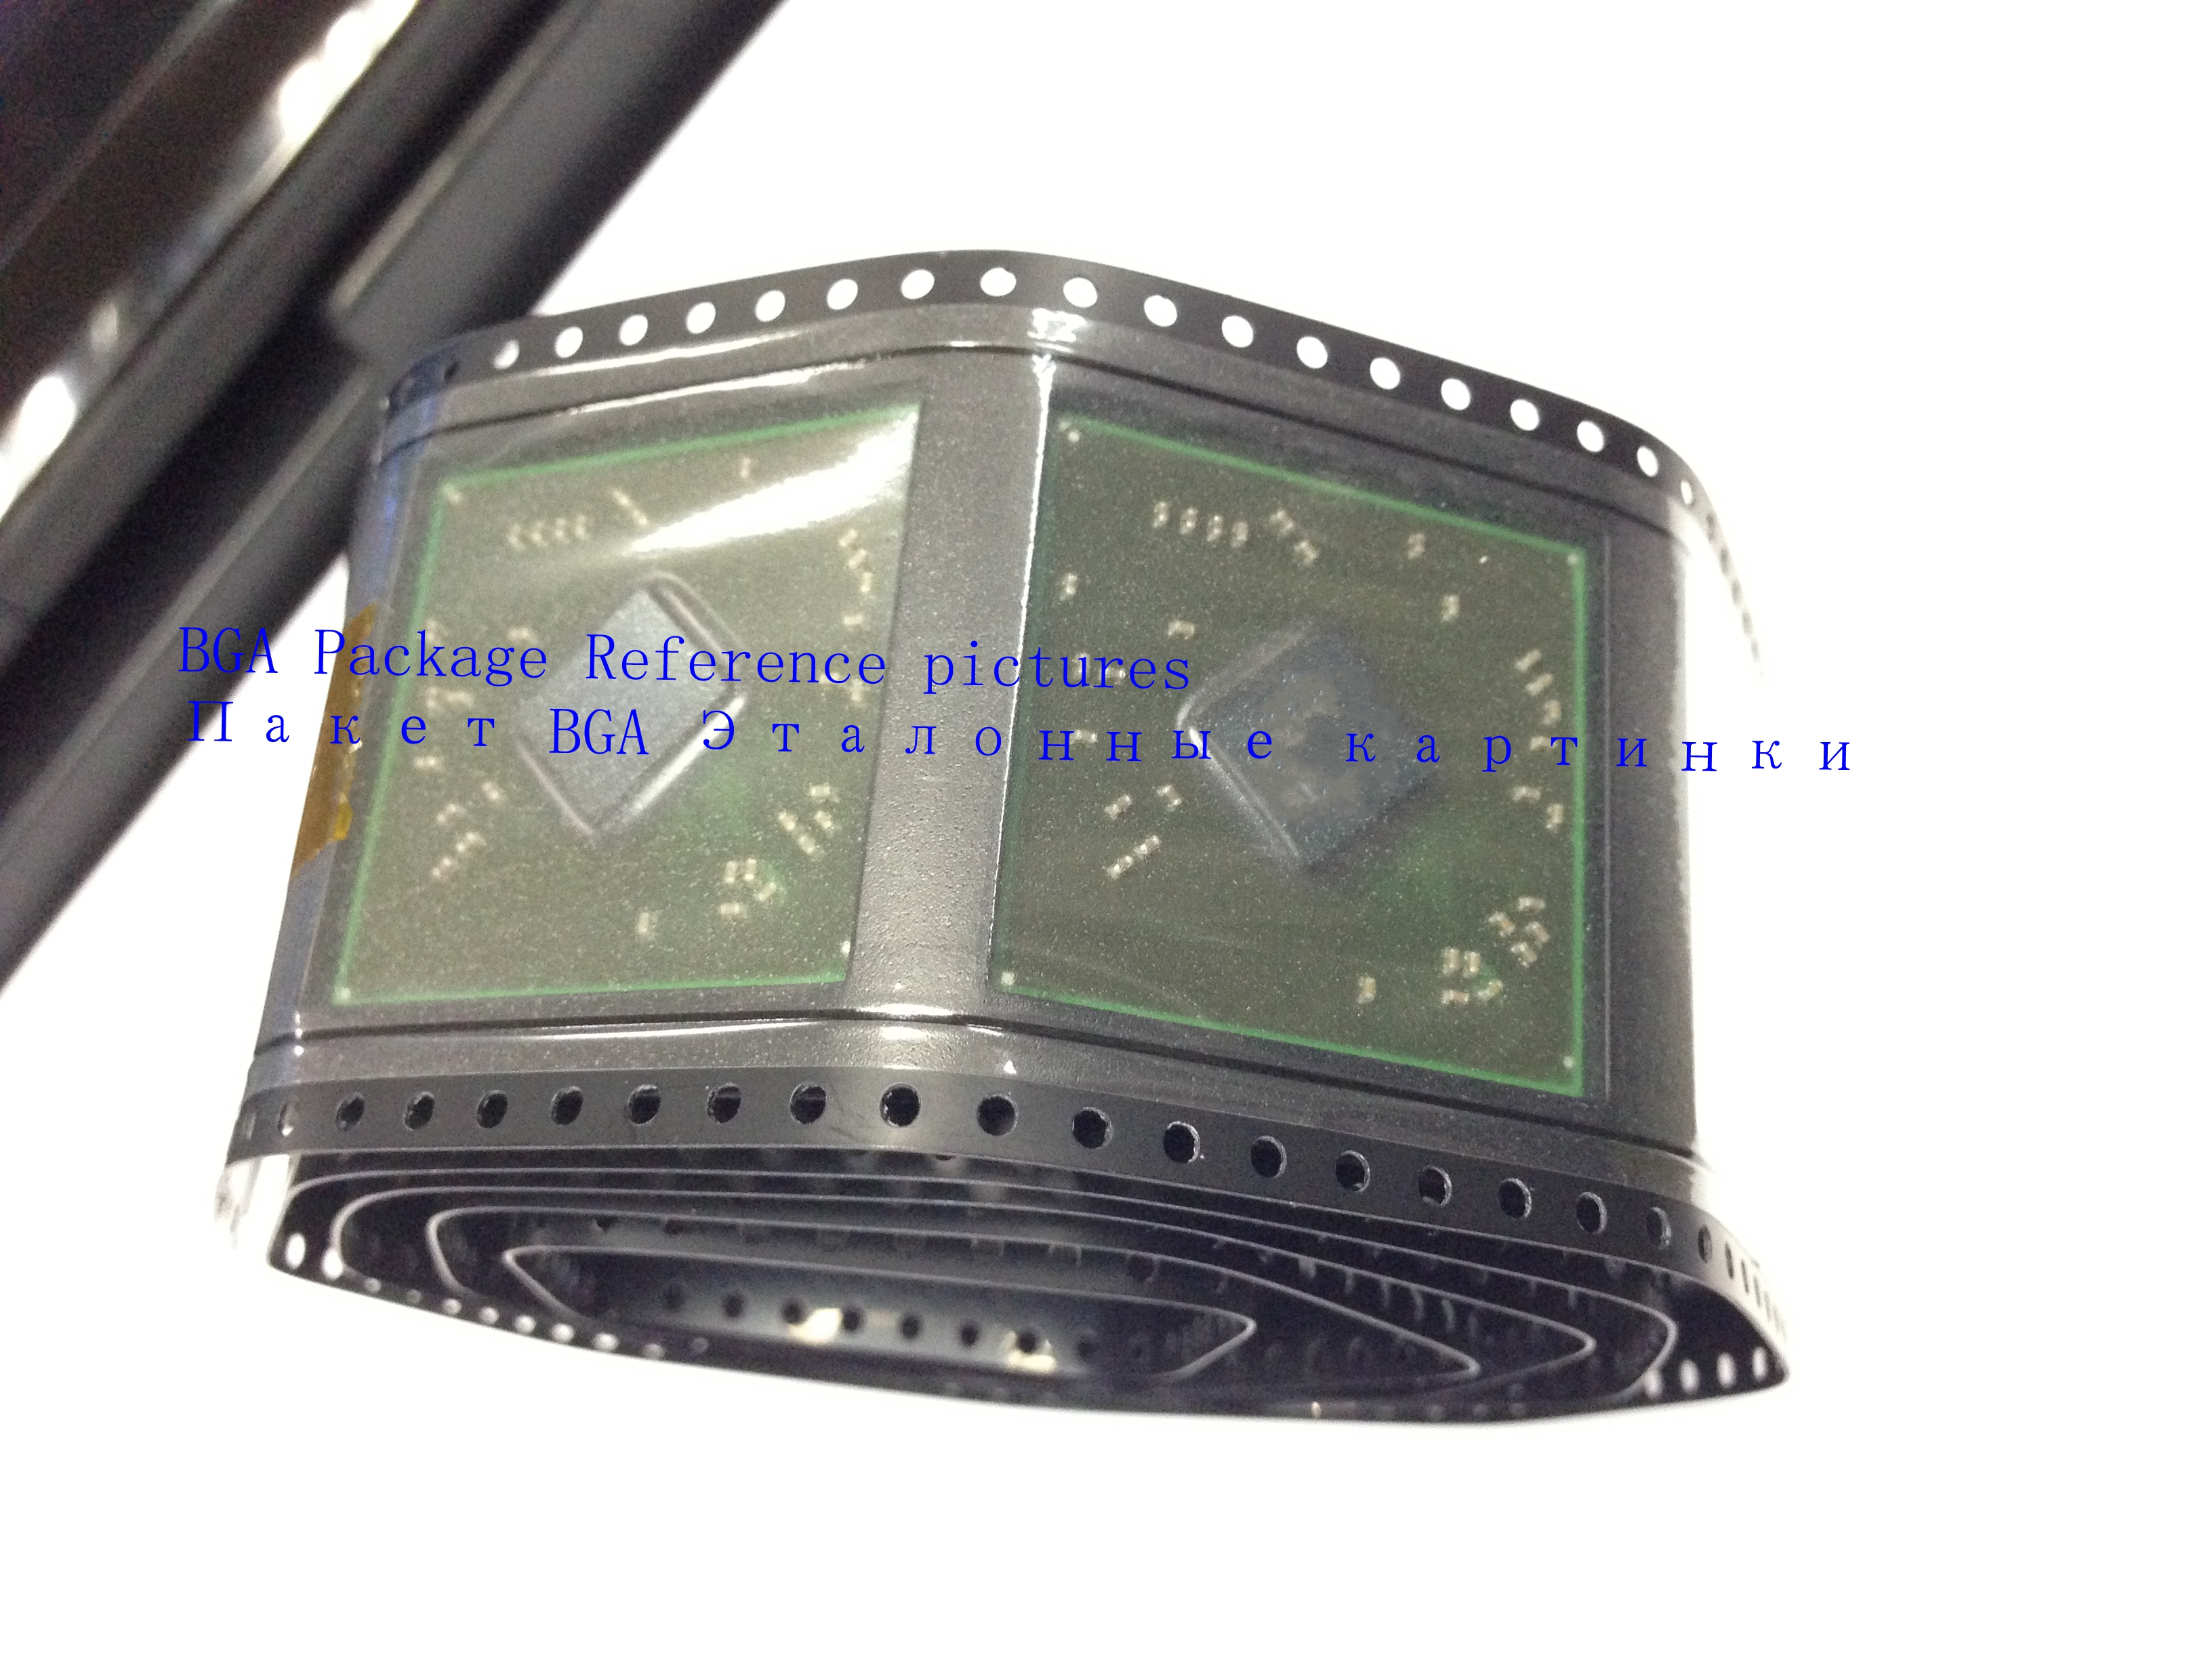 1pcs/lot 100% Original SLJ8C BD82HM77 BGA Chipset1pcs/lot 100% Original SLJ8C BD82HM77 BGA Chipset